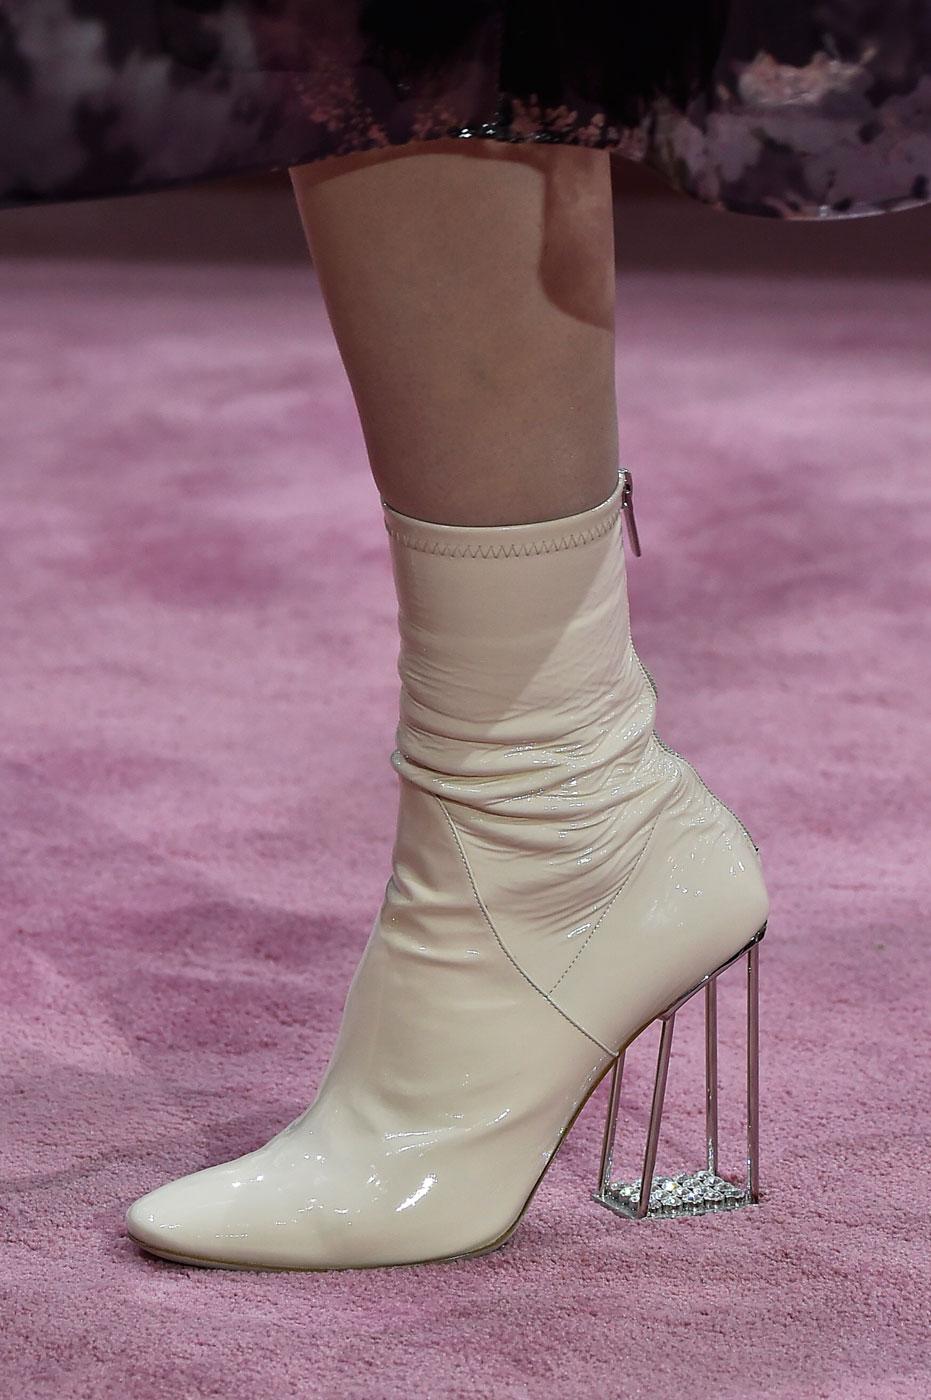 Christian-Dior-fashion-runway-show-close-ups-haute-couture-paris-spring-summer-2015-the-impression-168